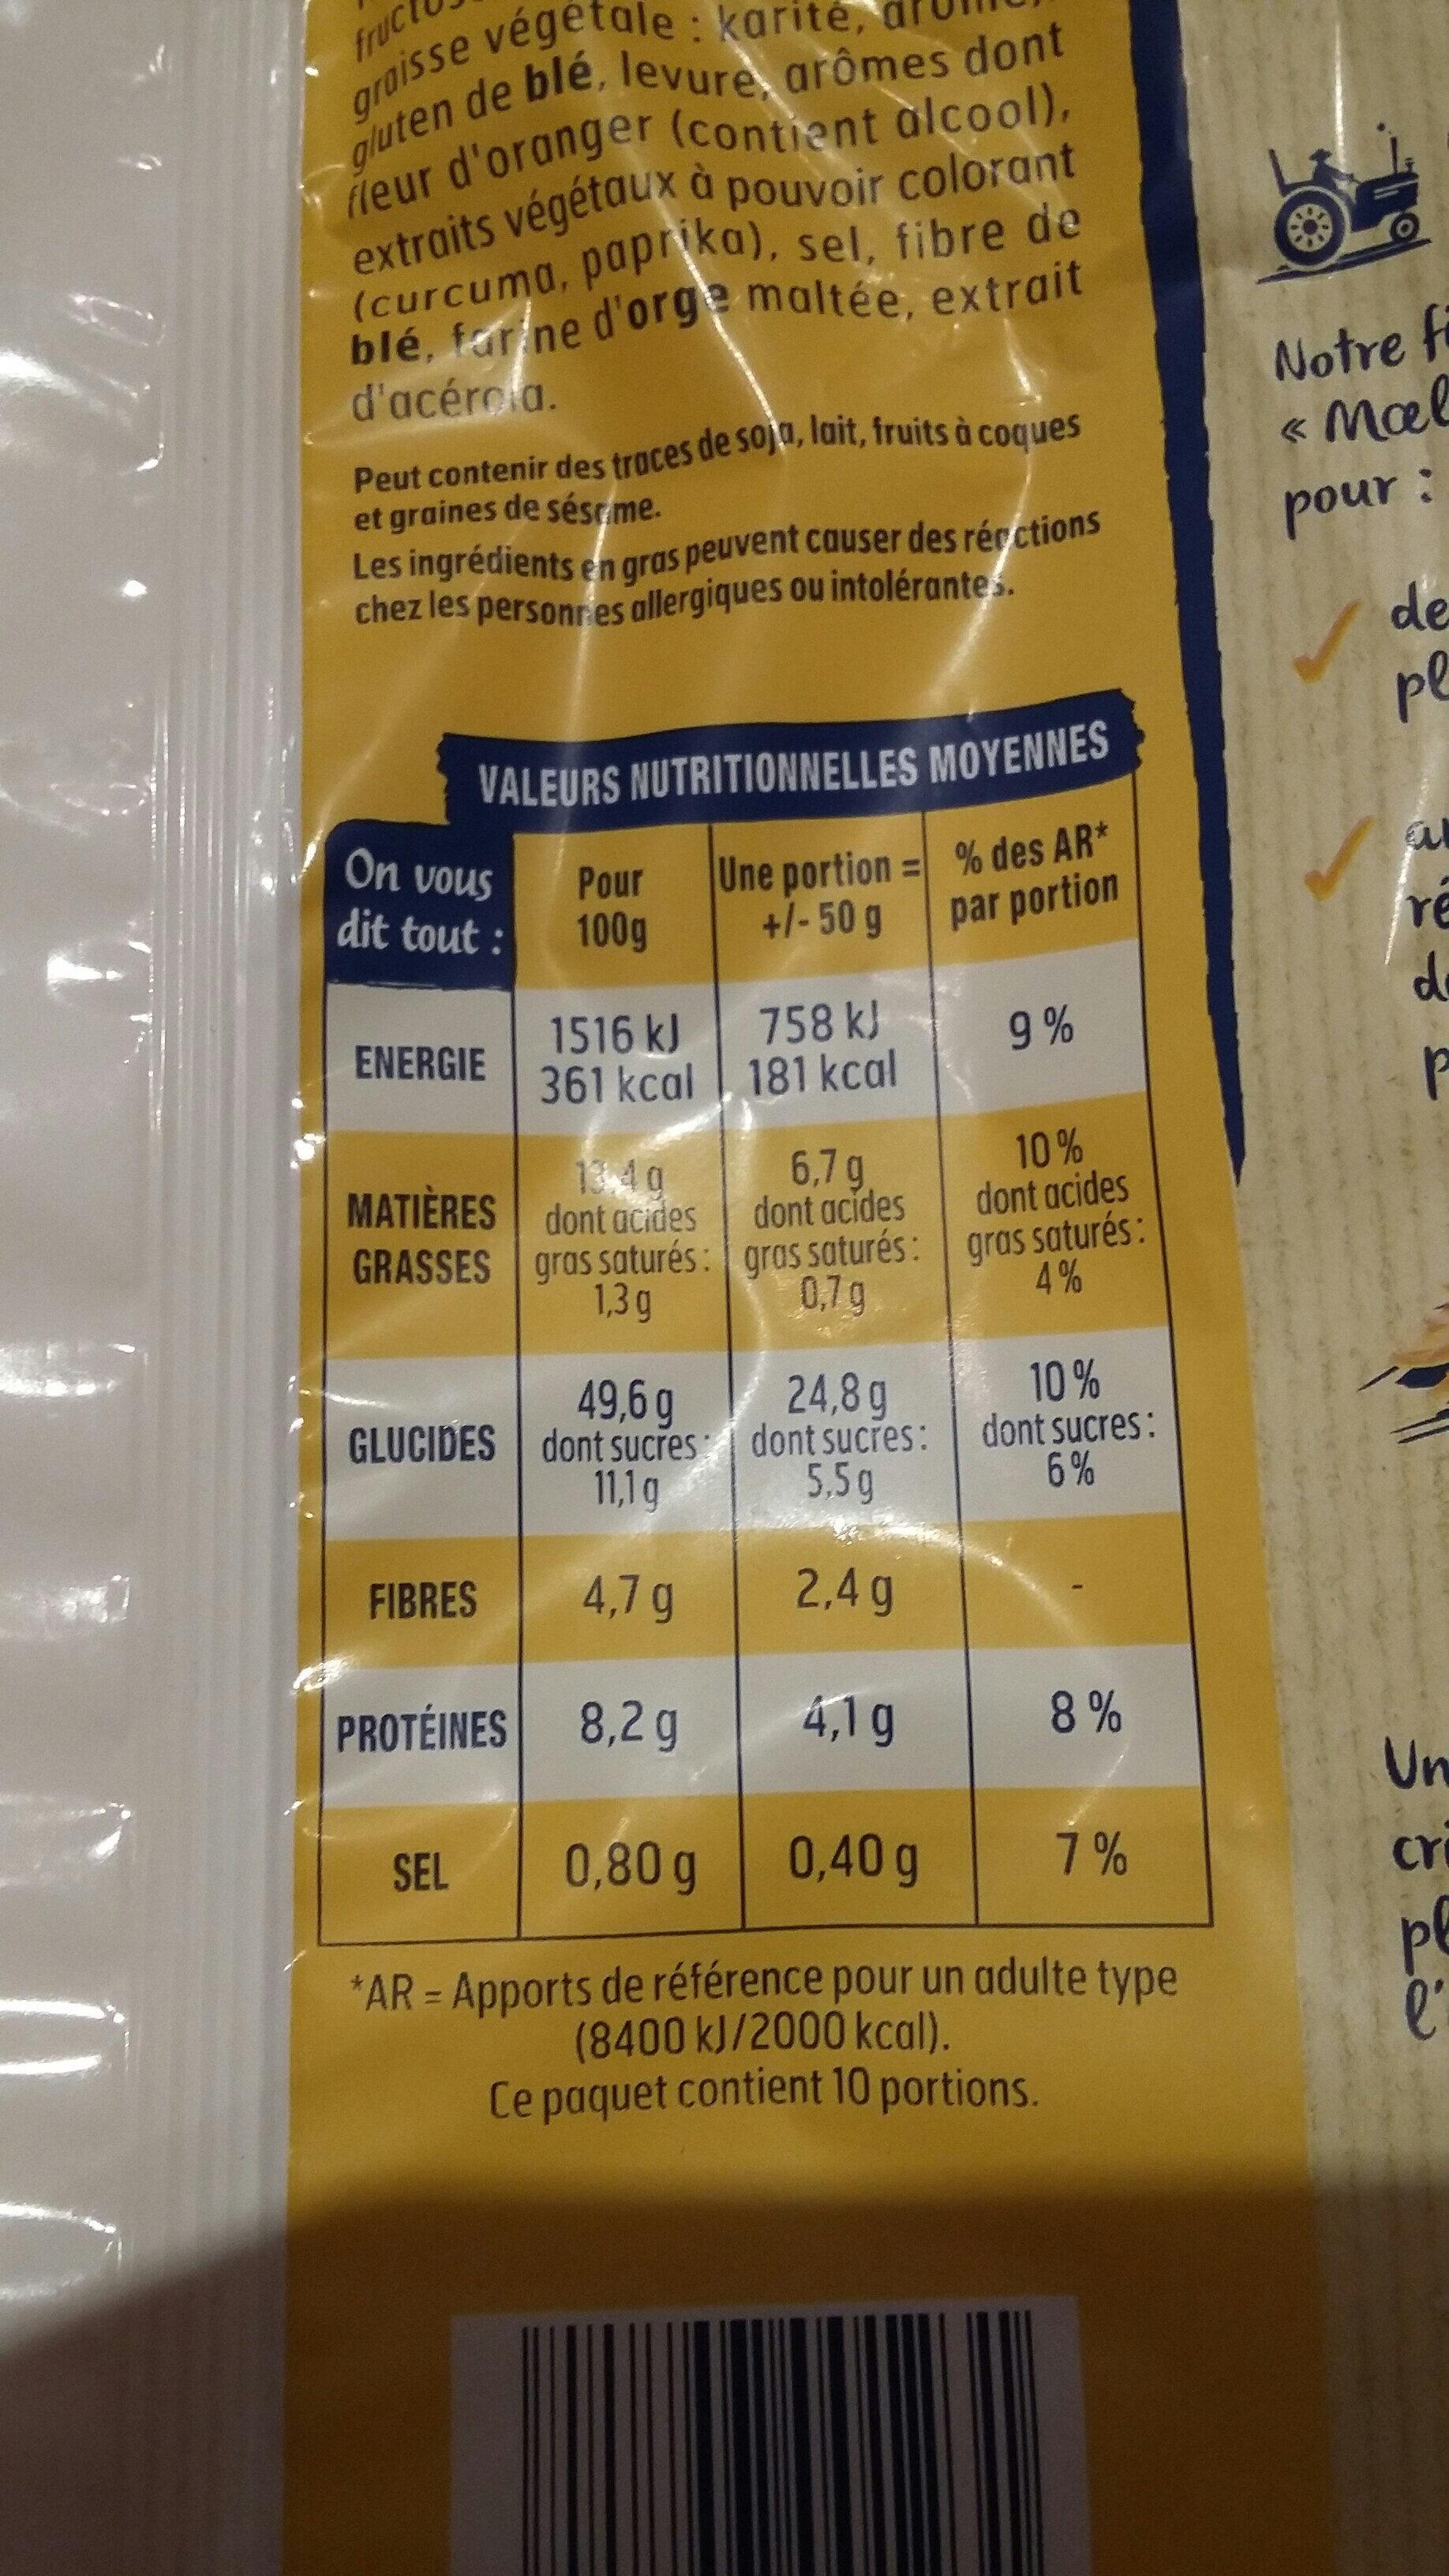 Brioche tressée nature ss additifs - Informations nutritionnelles - fr